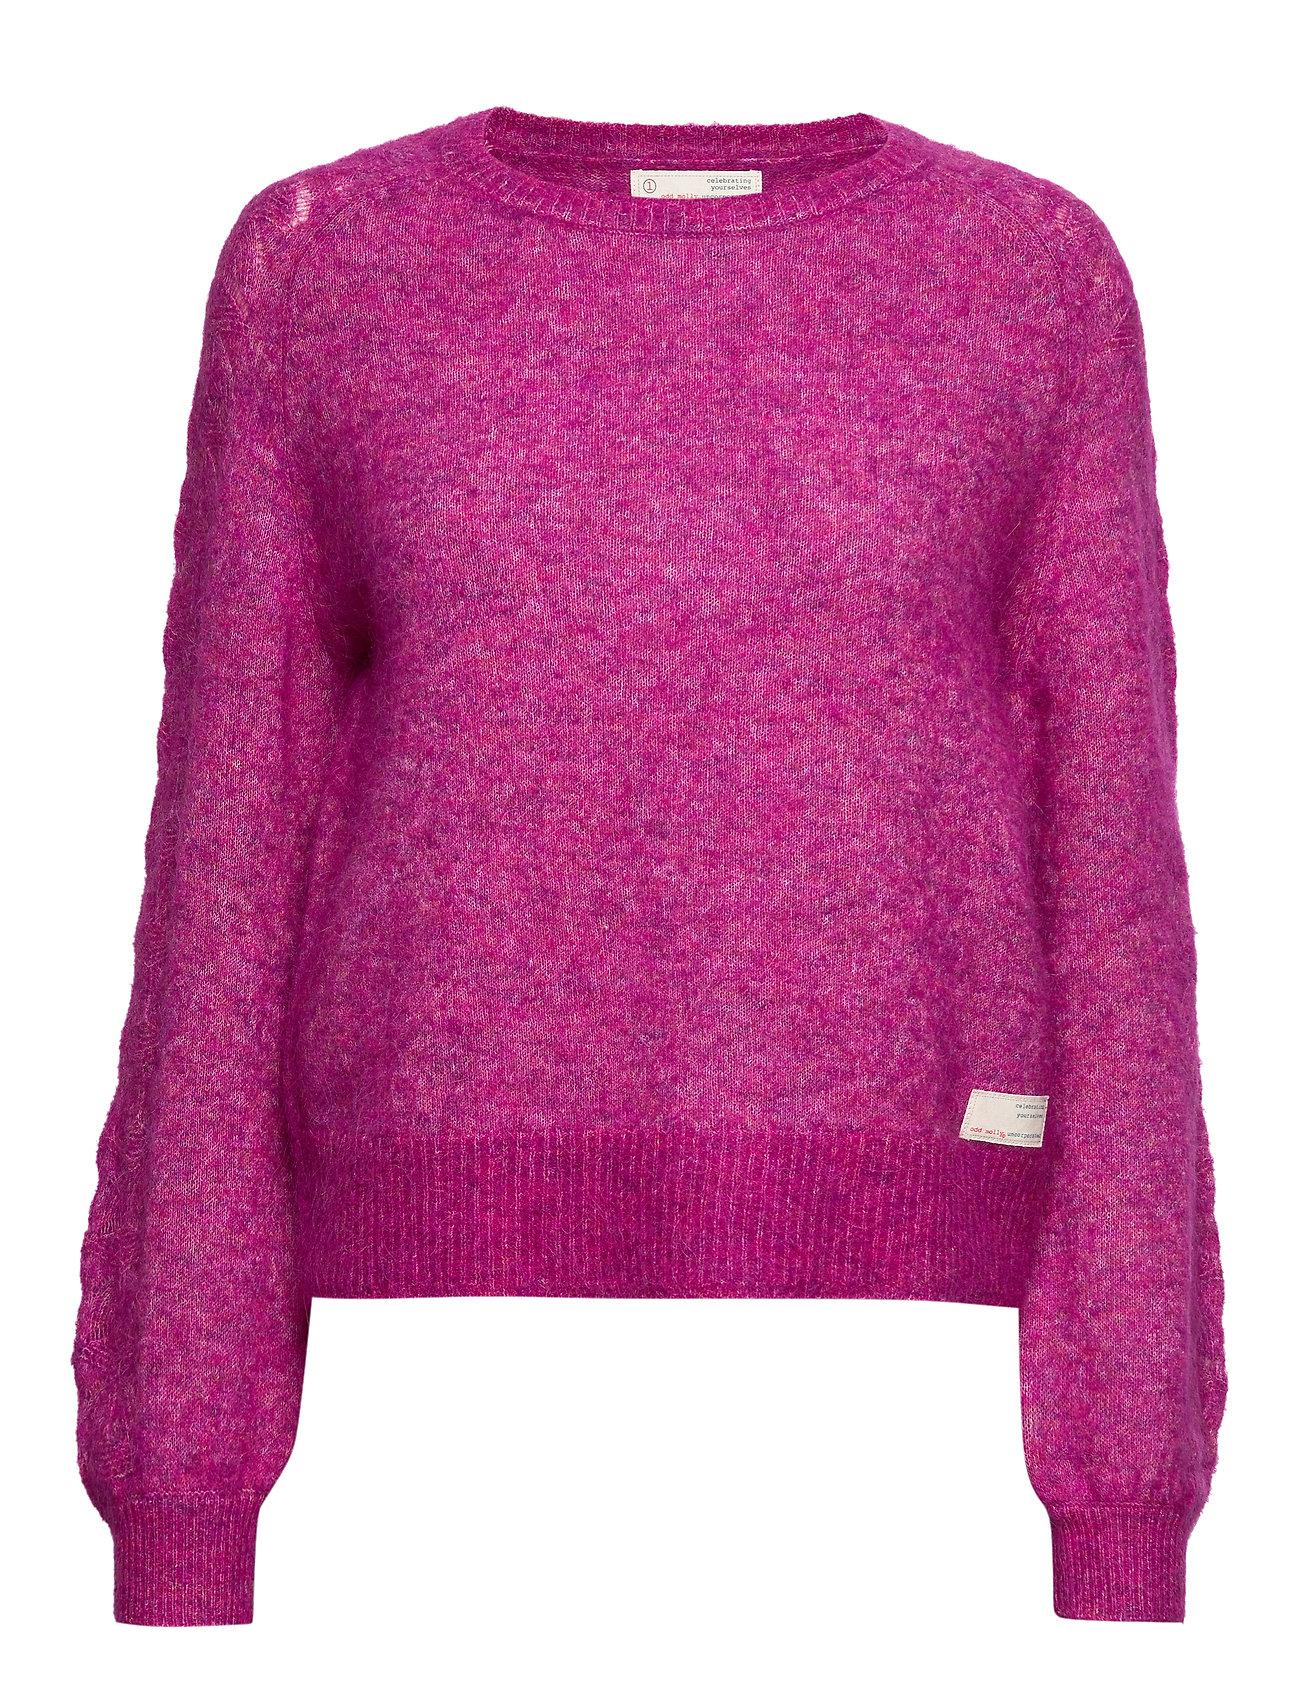 ODD MOLLY Cool With Wool Sweater - FIREWORK FUCHSIA